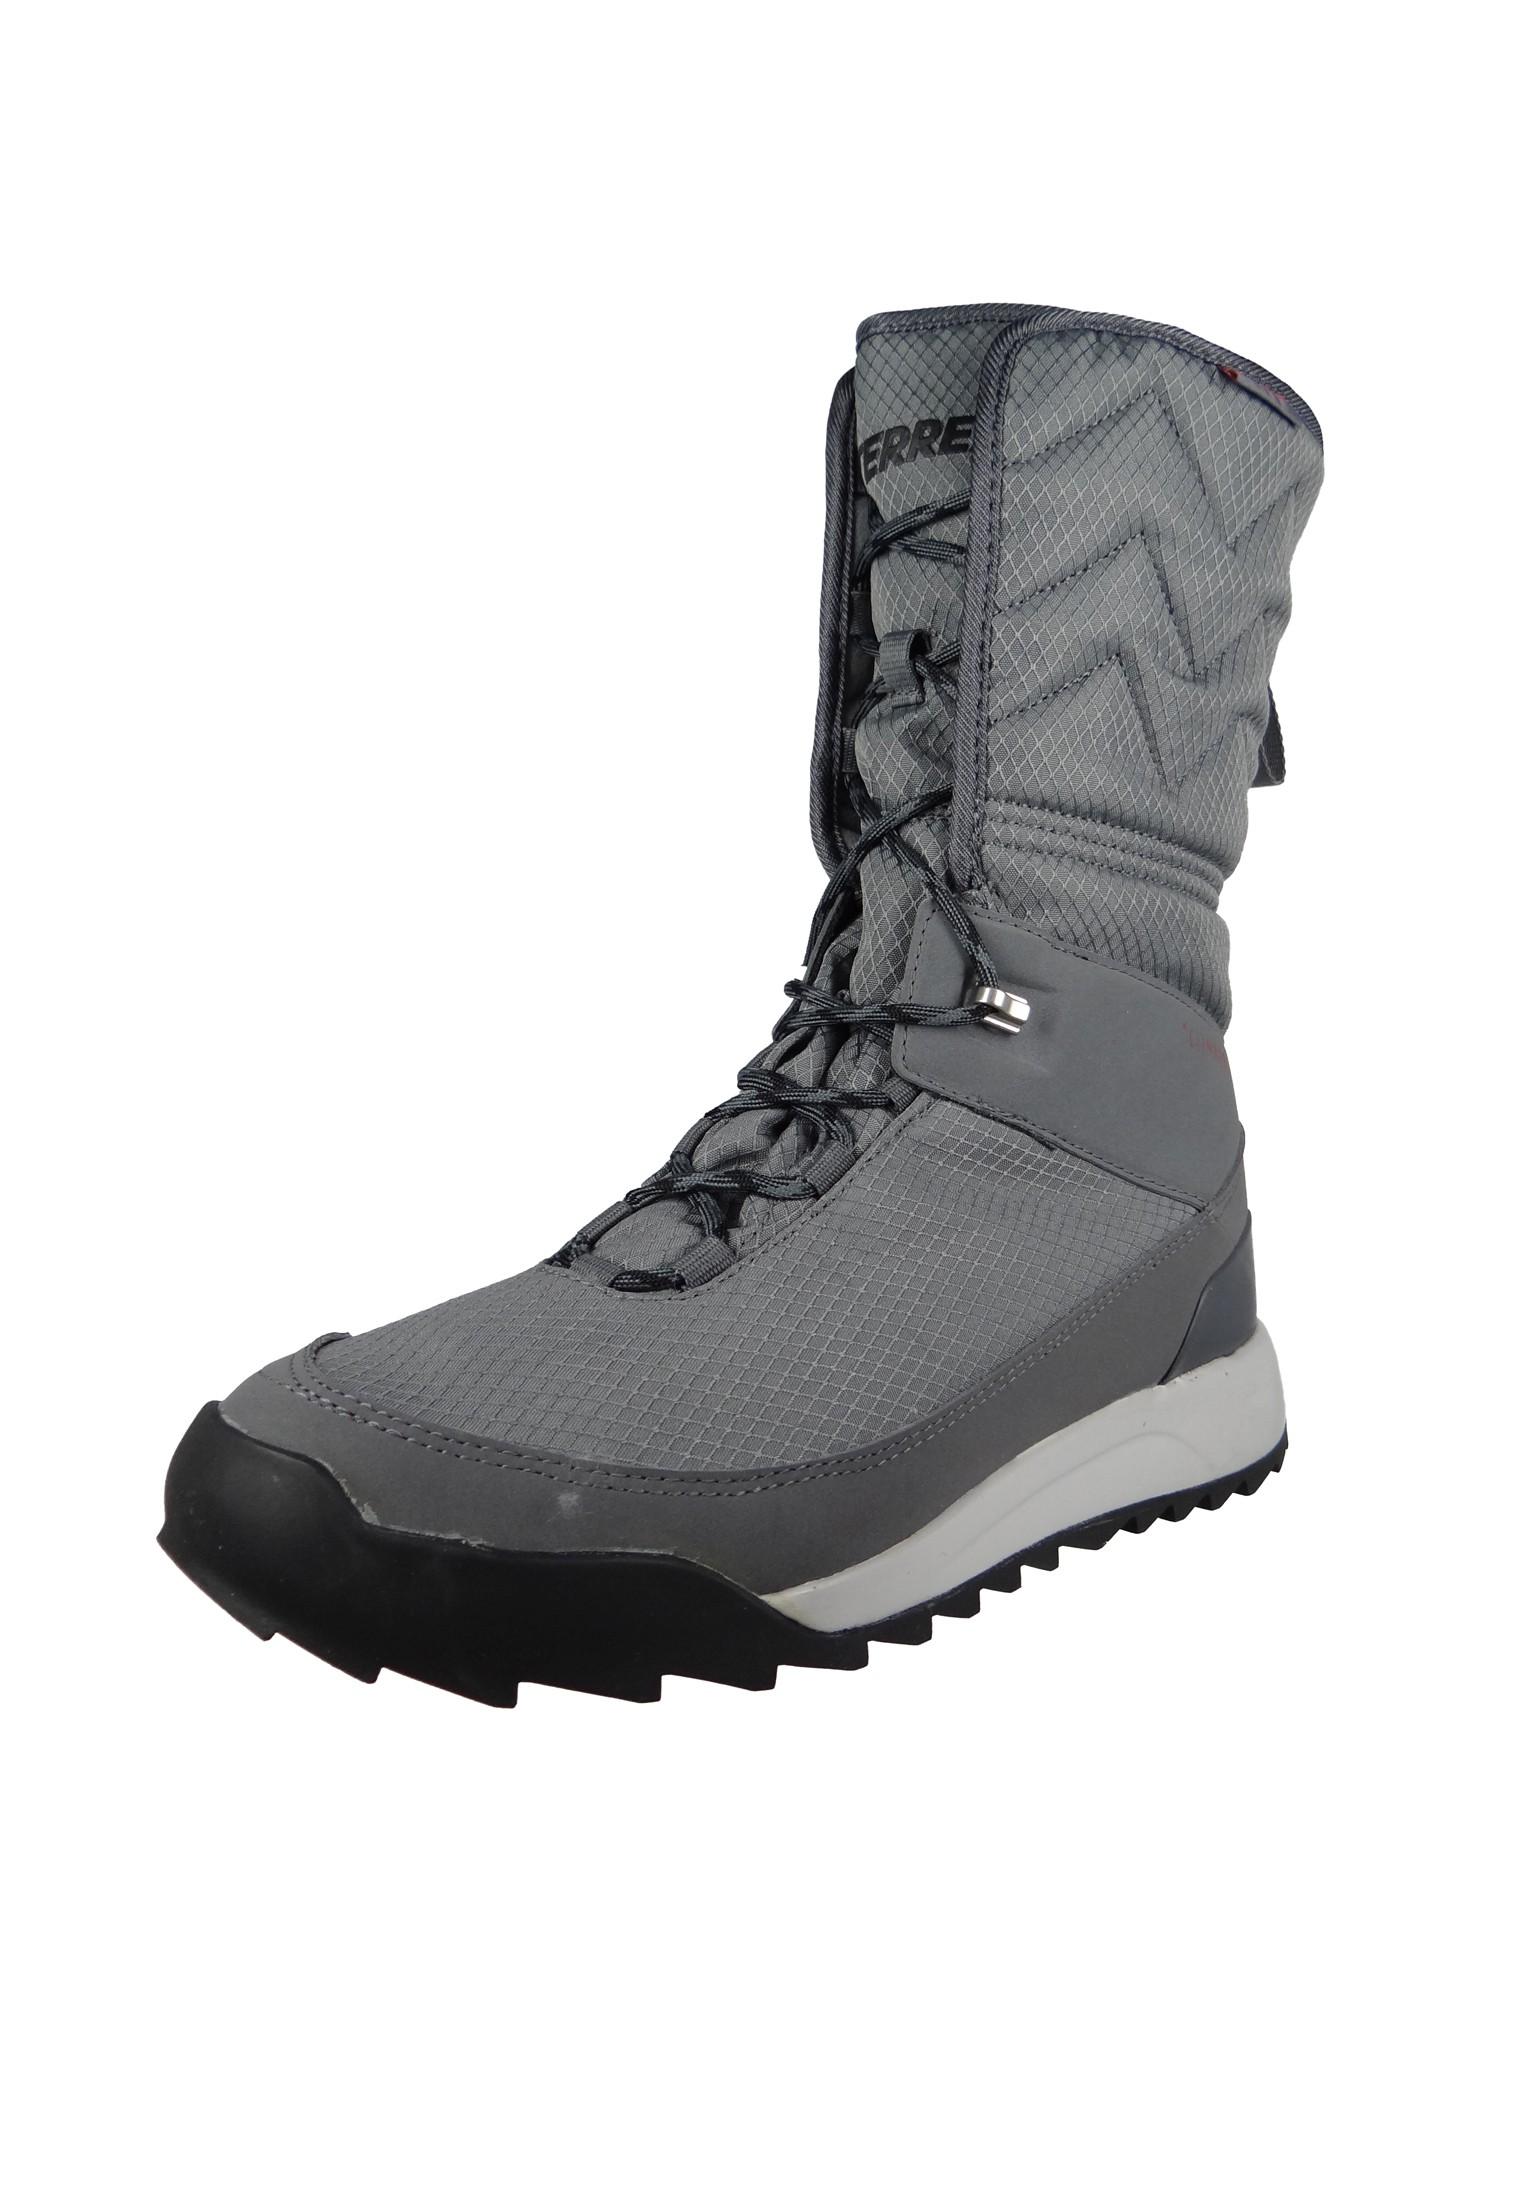 adidas Damen Winterstiefel Boots CHOLEAH HIGH CP S80743 Grau grey four f17grey five 17core black